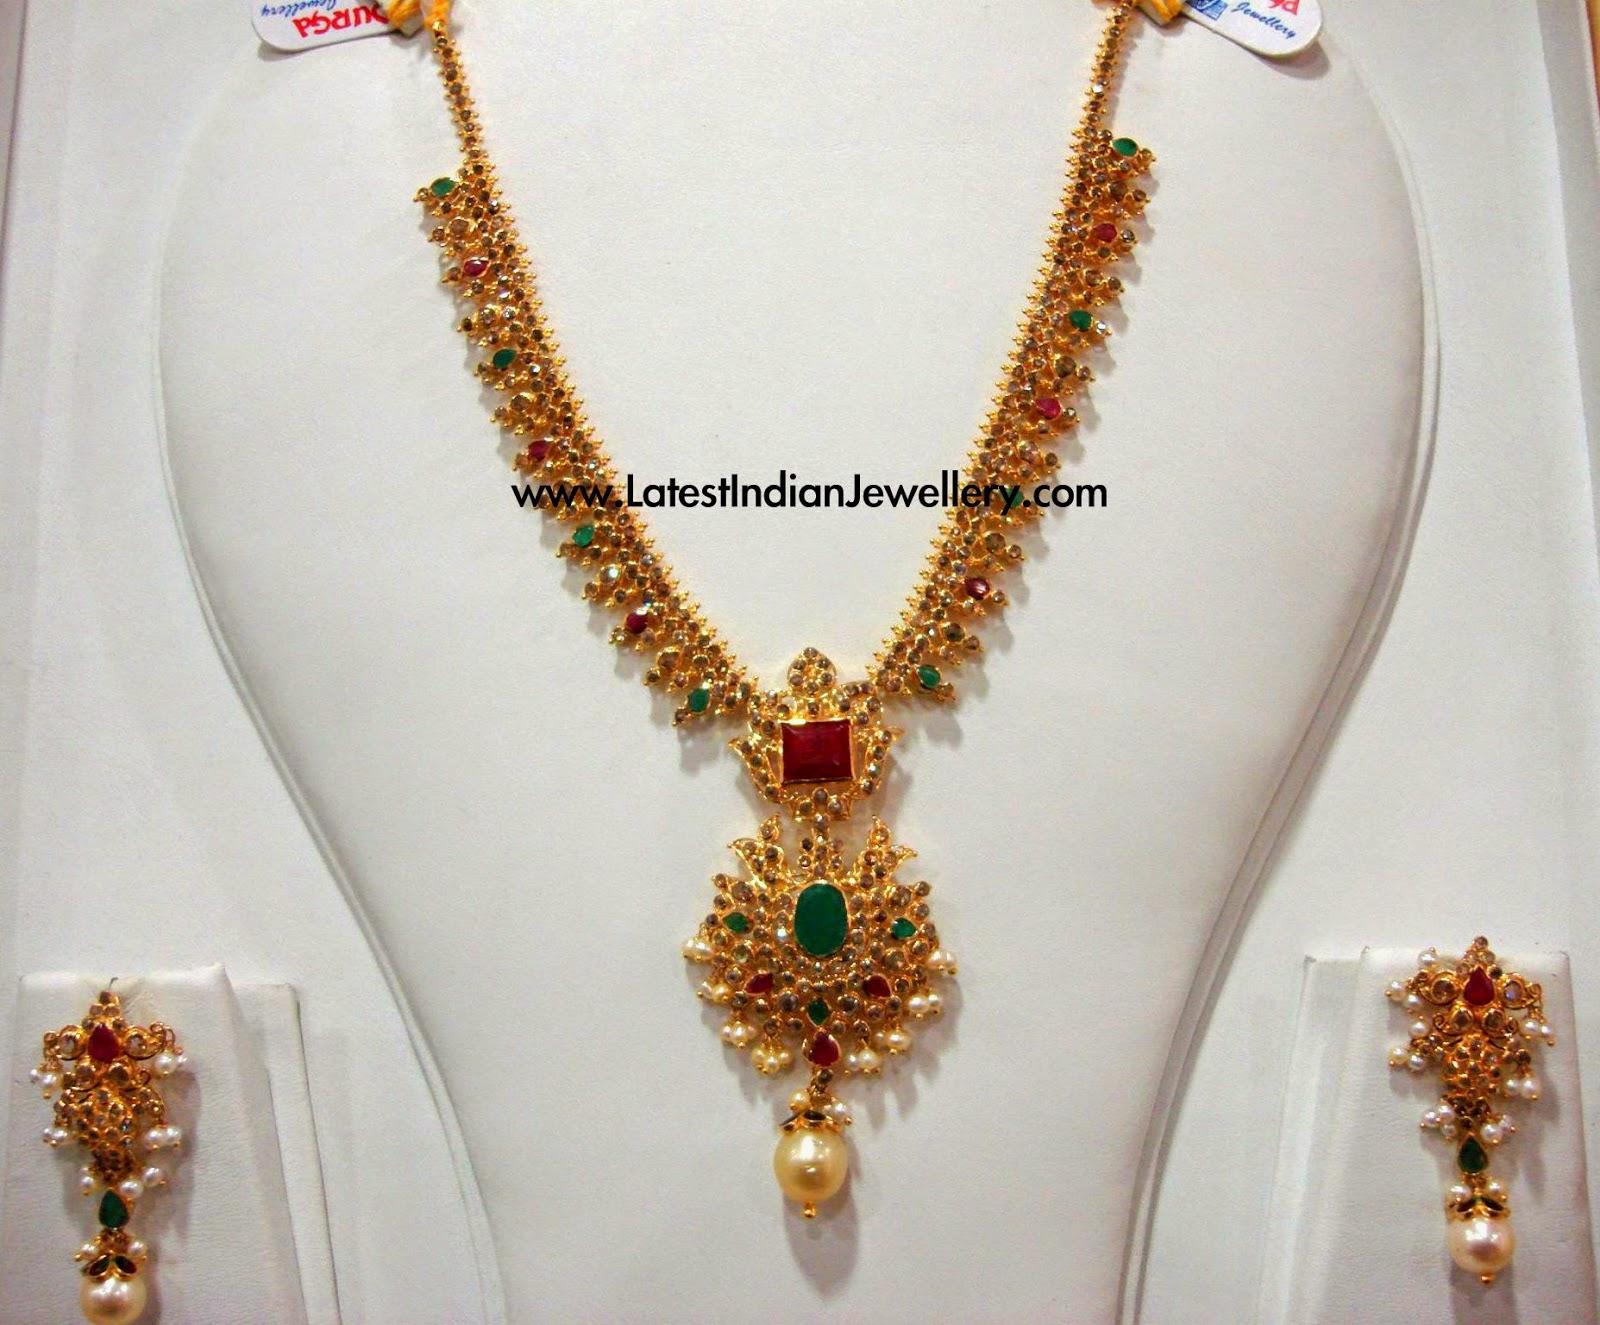 uncut diamond gold necklace in simple design latest indian